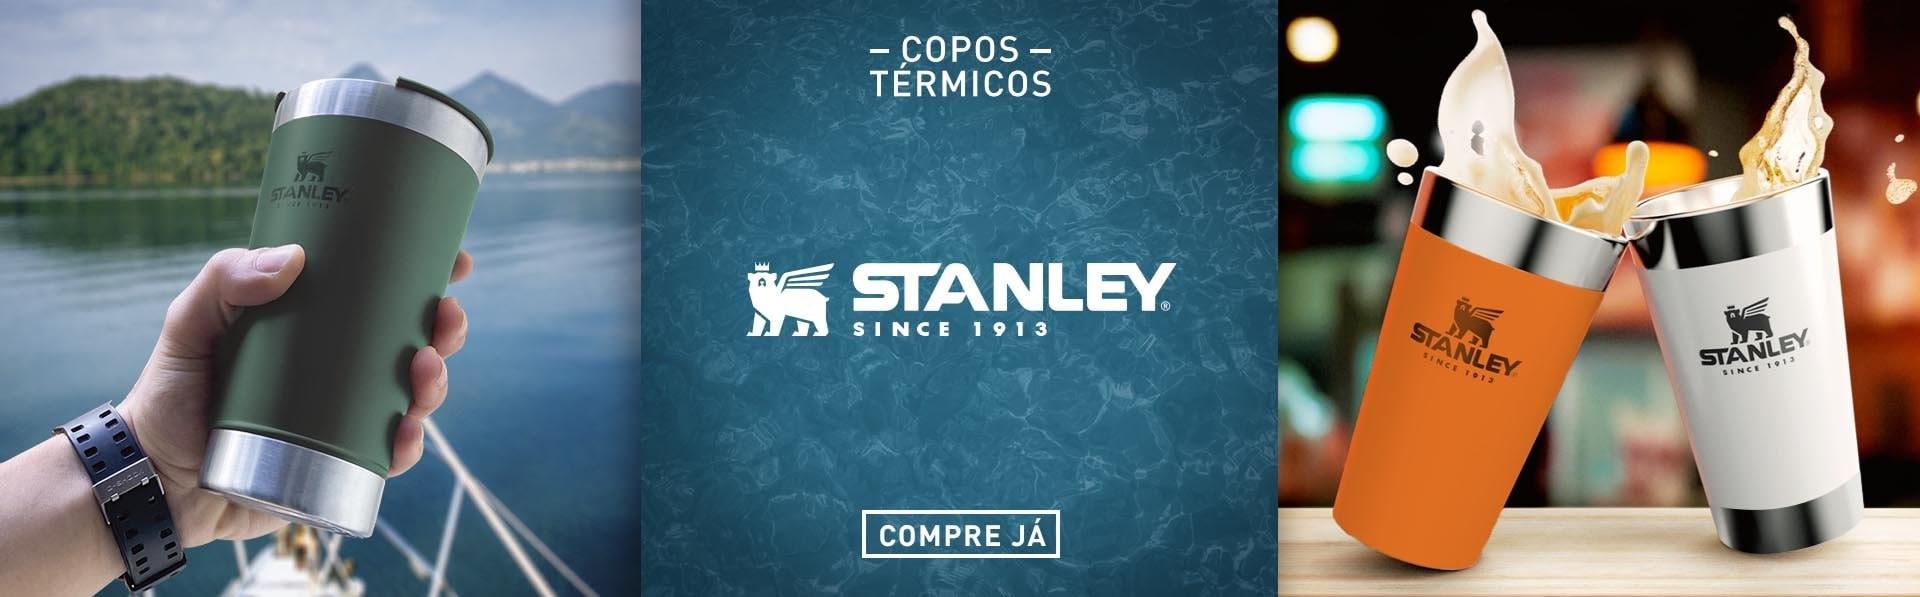 Pré-venda Copos Stanley